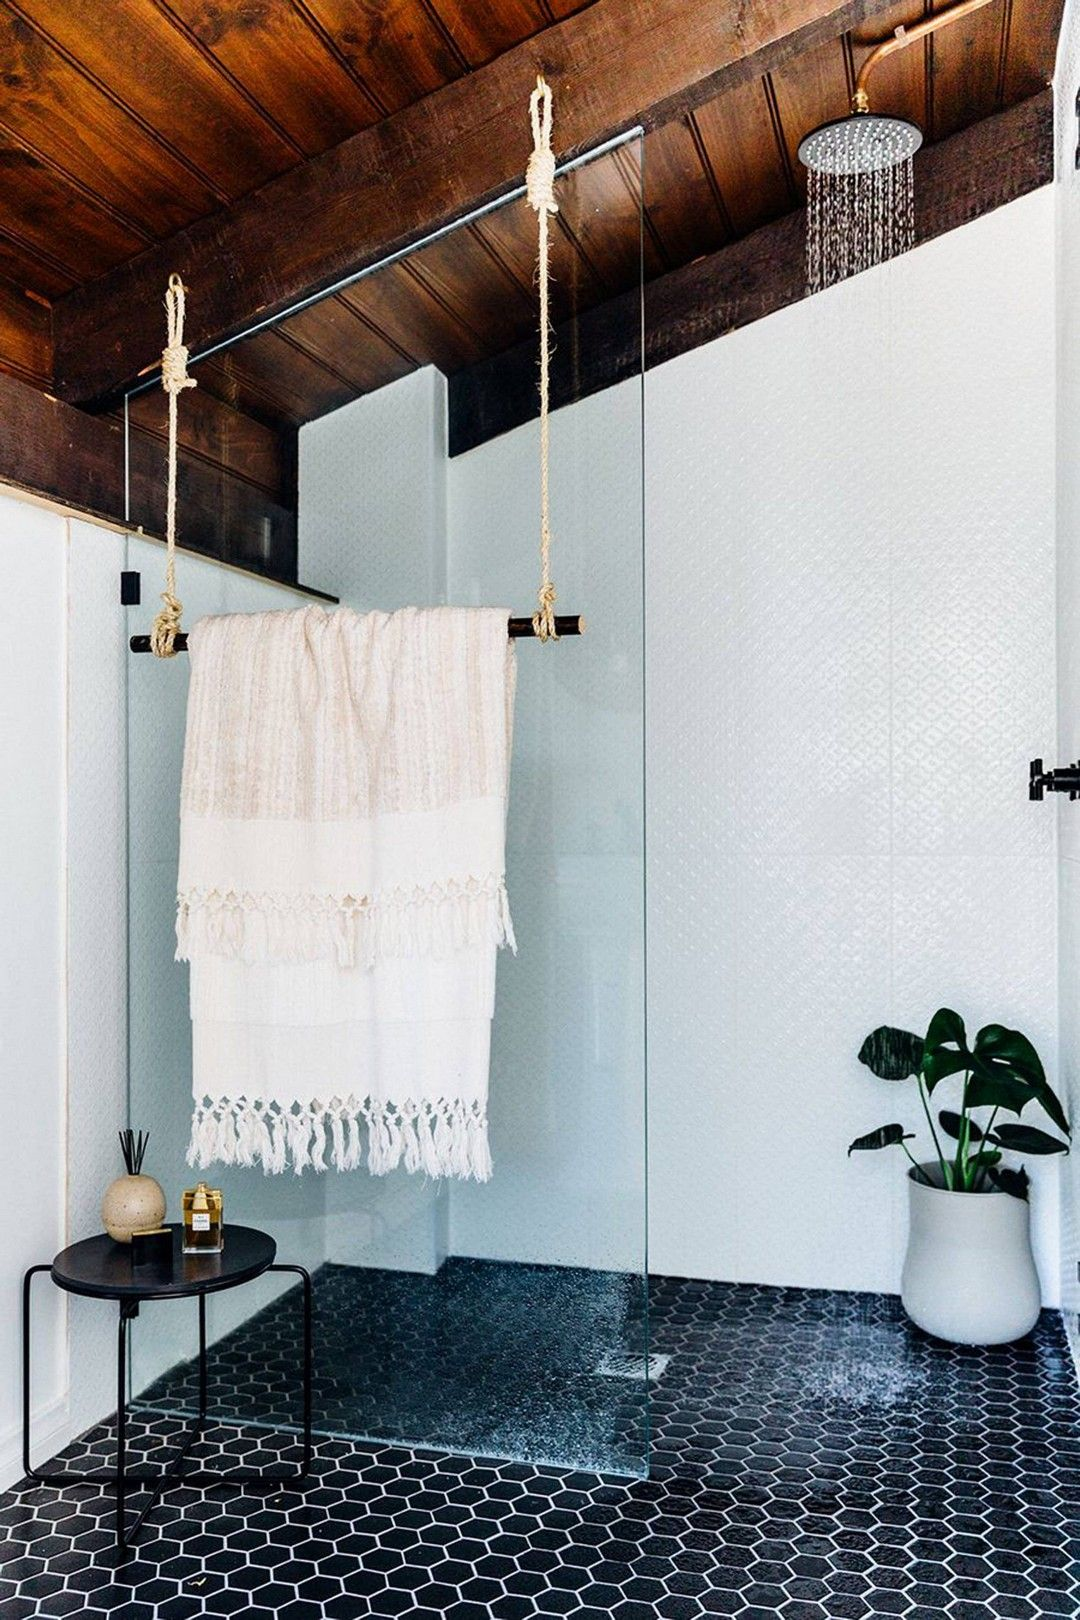 24 Small Bathroom Design Trends 2019 Bathroom Trends Bathroom Design Trends Bathroom Design